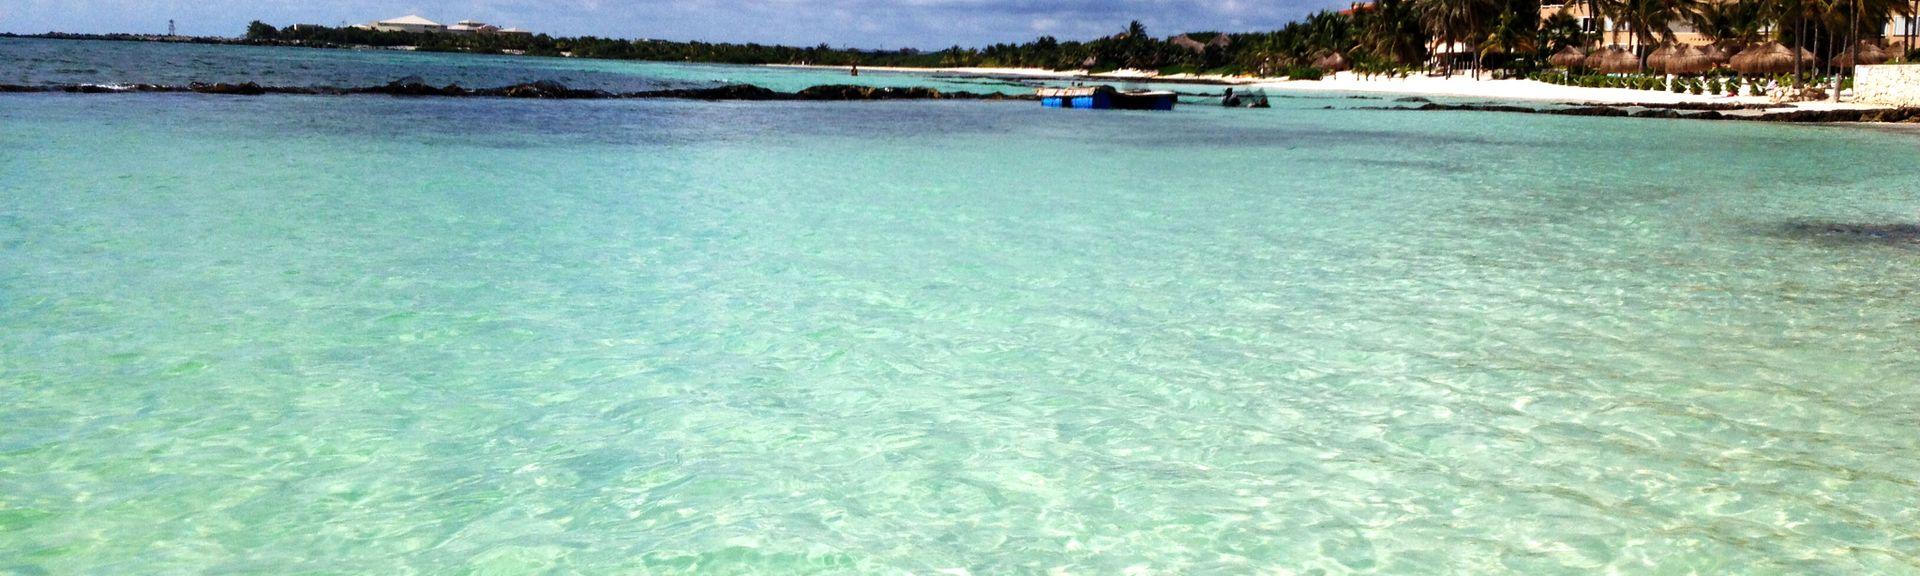 Lagon Yal-ku, Akumal, Quintana Roo, Mexique